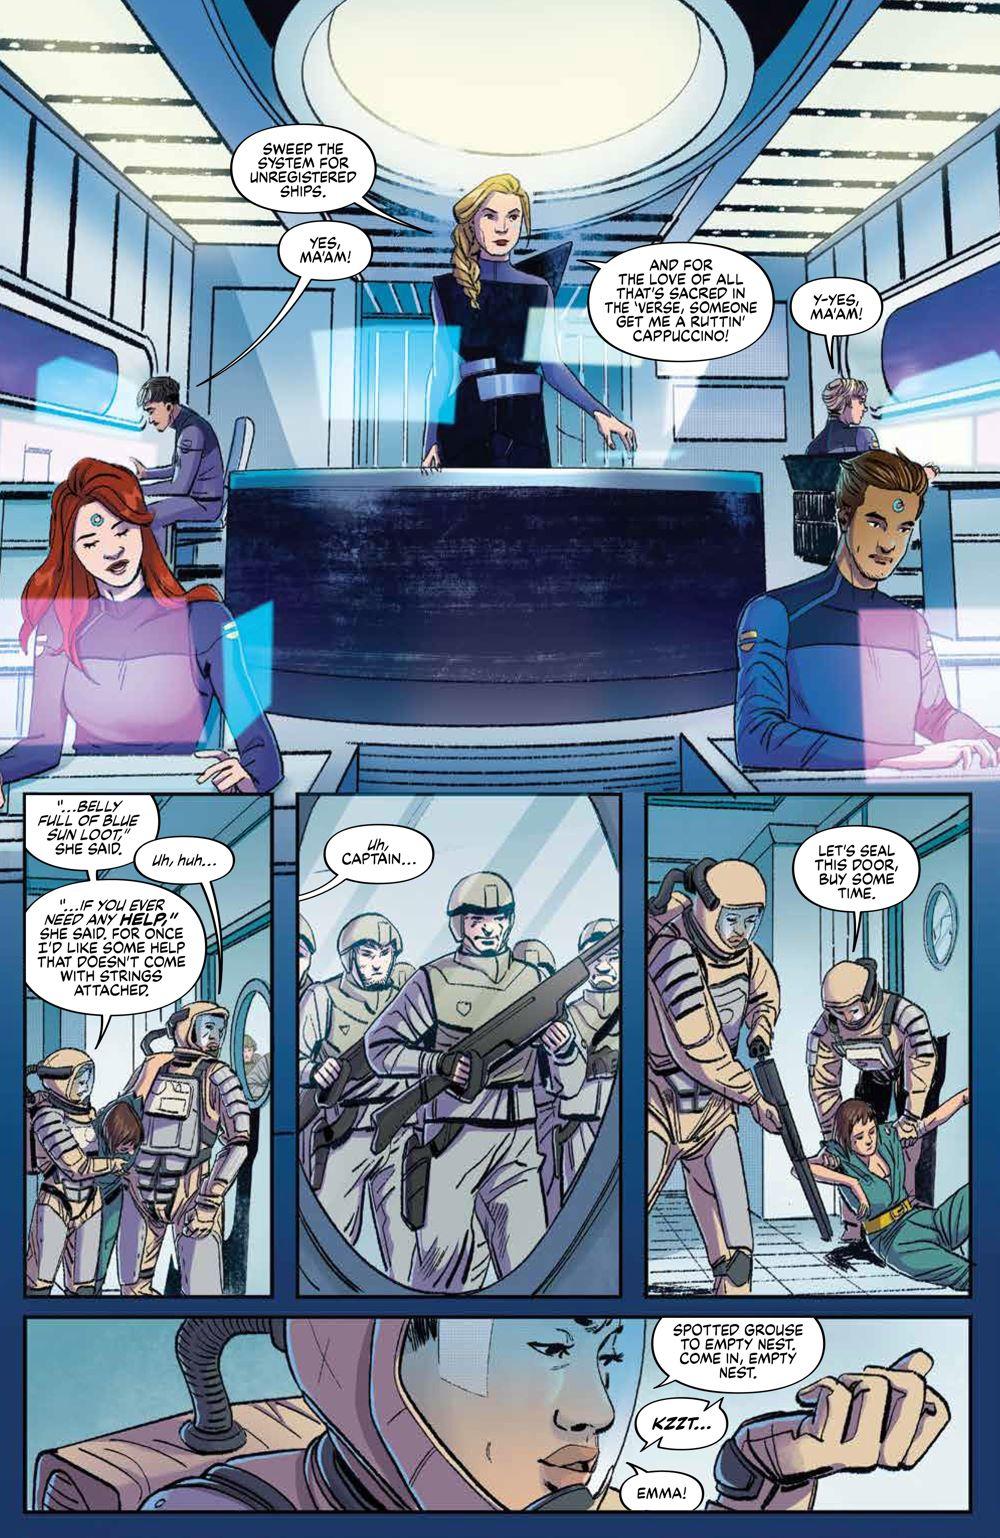 Firefly_BrandNewVerse_002_PRESS_4 ComicList Previews: FIREFLY A BRAND NEW 'VERSE #2 (OF 6)